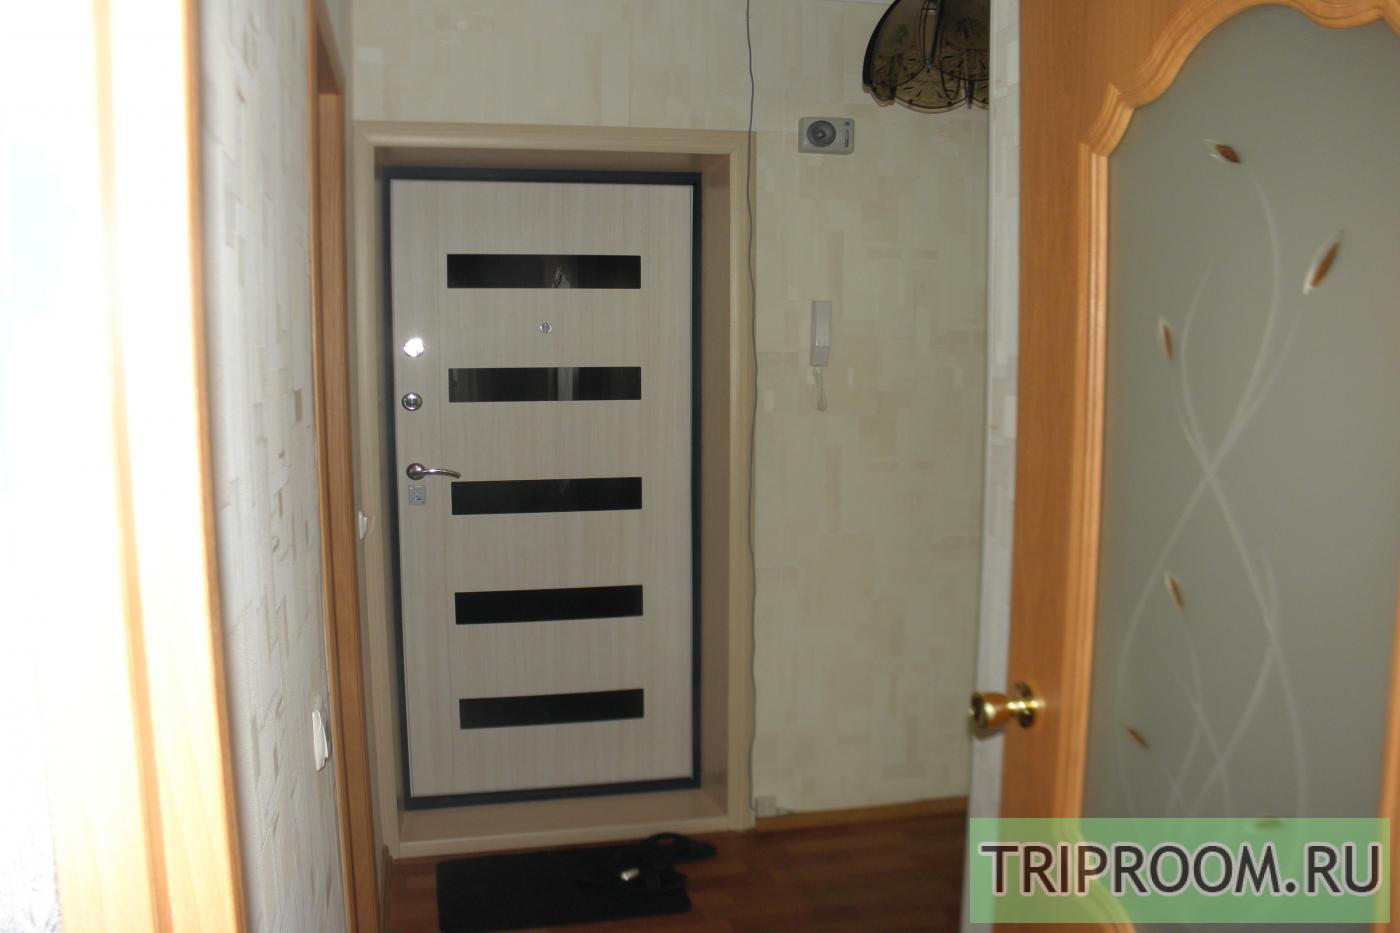 1-комнатная квартира посуточно (вариант № 1497), ул. Флегонтова улица, фото № 9